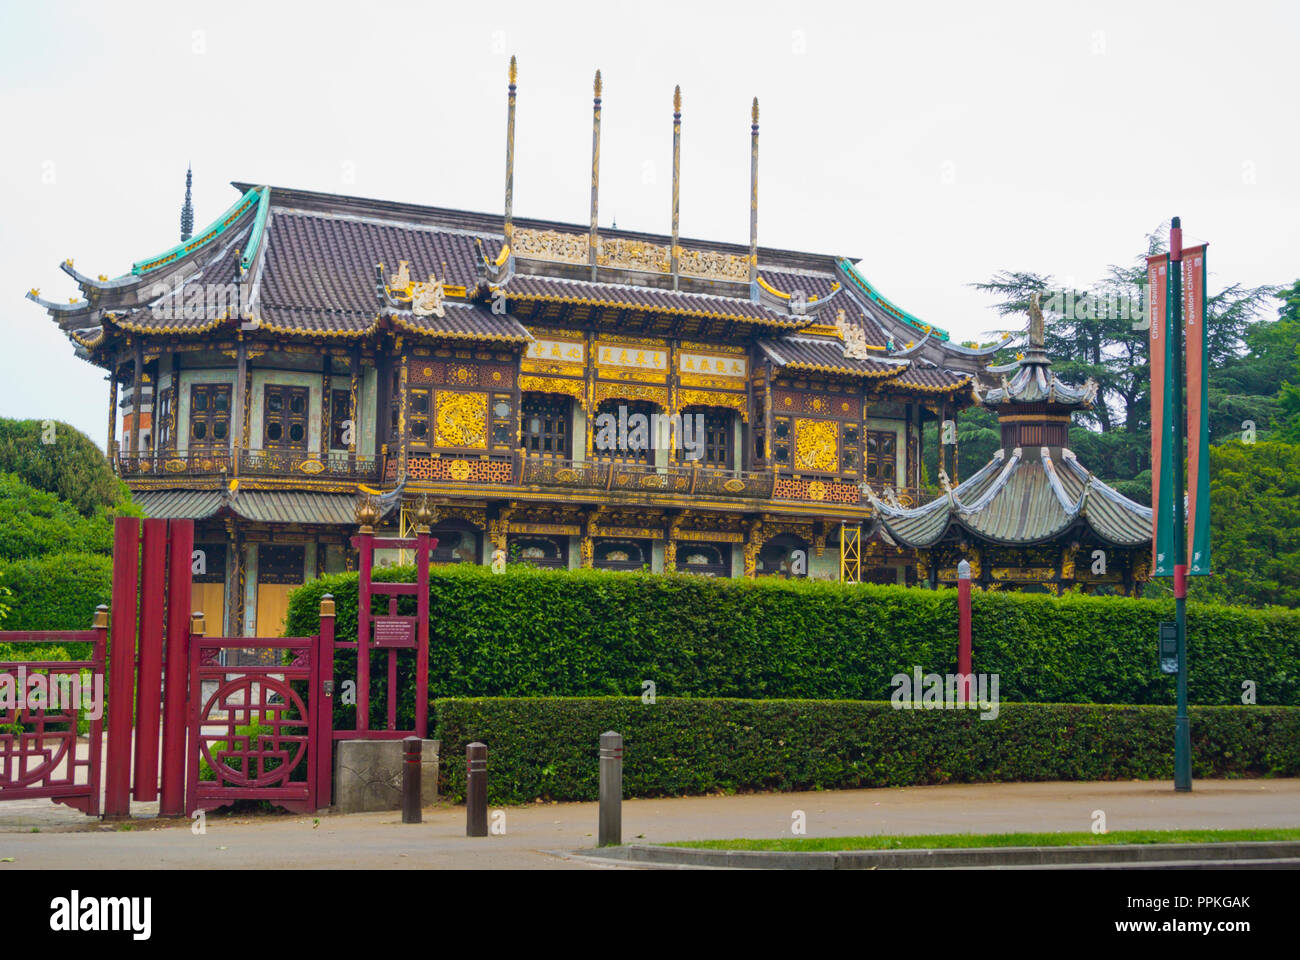 Pavillon Chinois, Pabellón Chino, alberga los museos del lejano oriente, Mutsaard, Bruselas, Bélgica Imagen De Stock